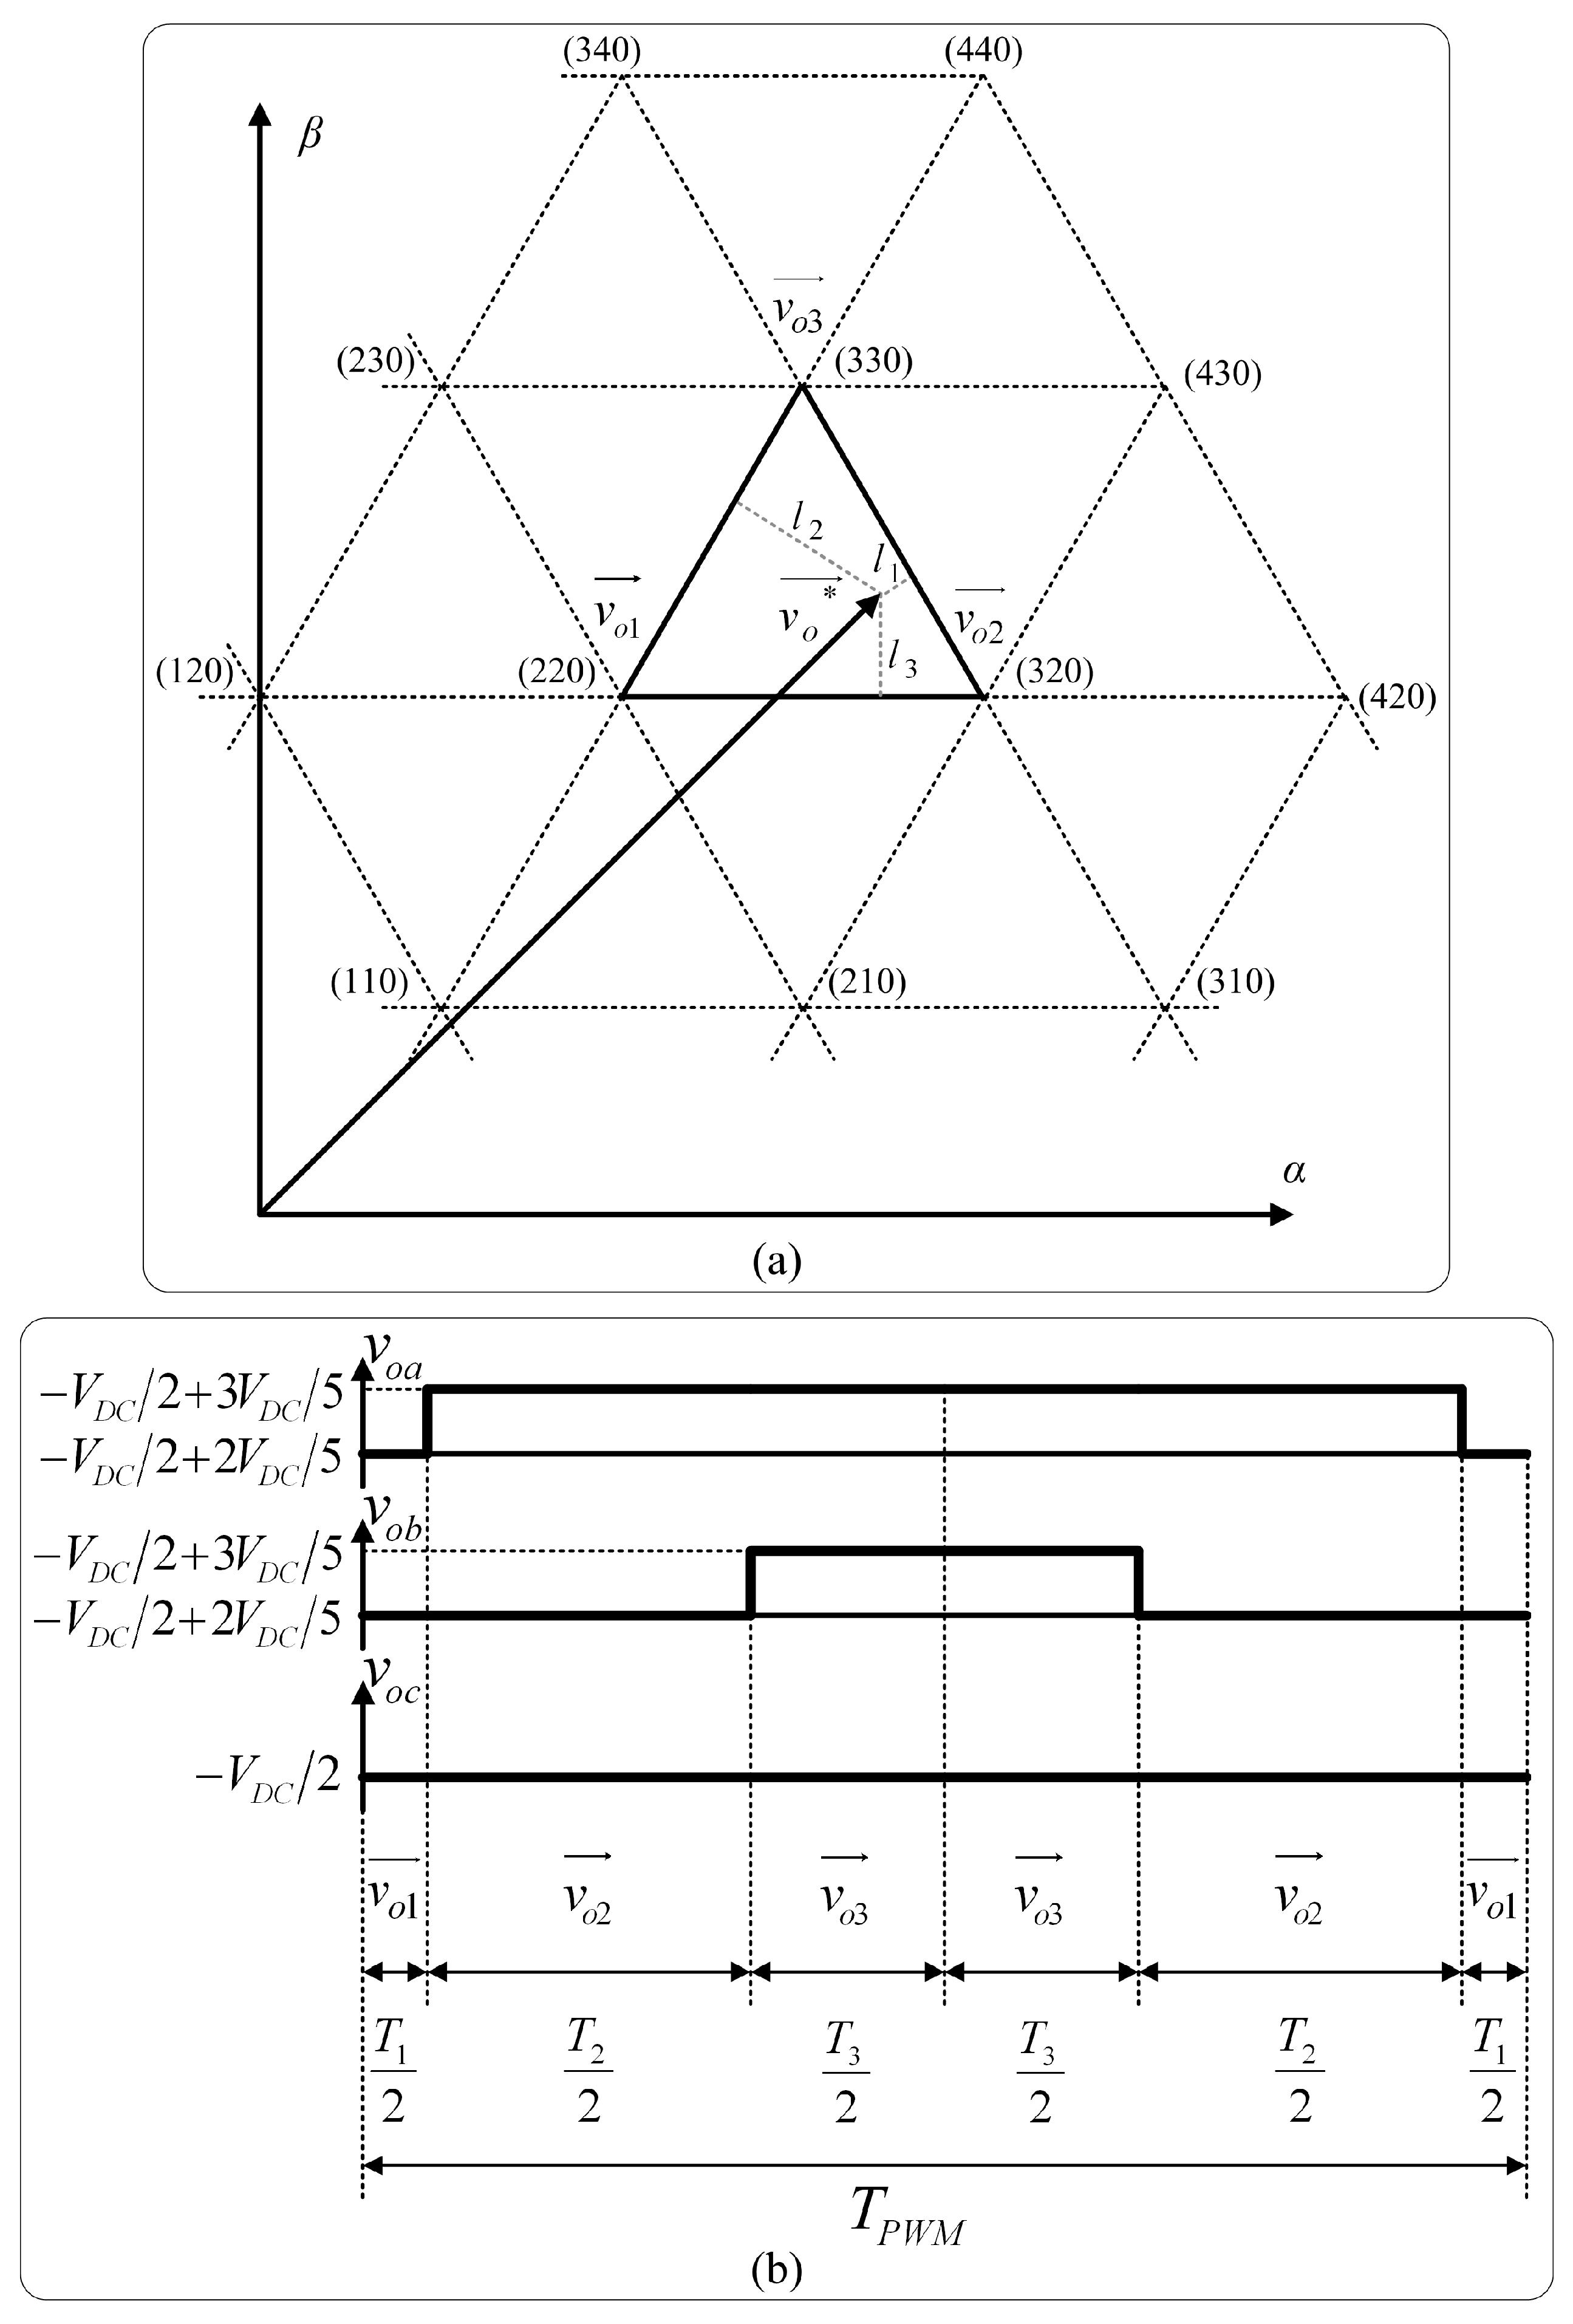 Energies   Free Full-Text   Modular Multilevel Converters